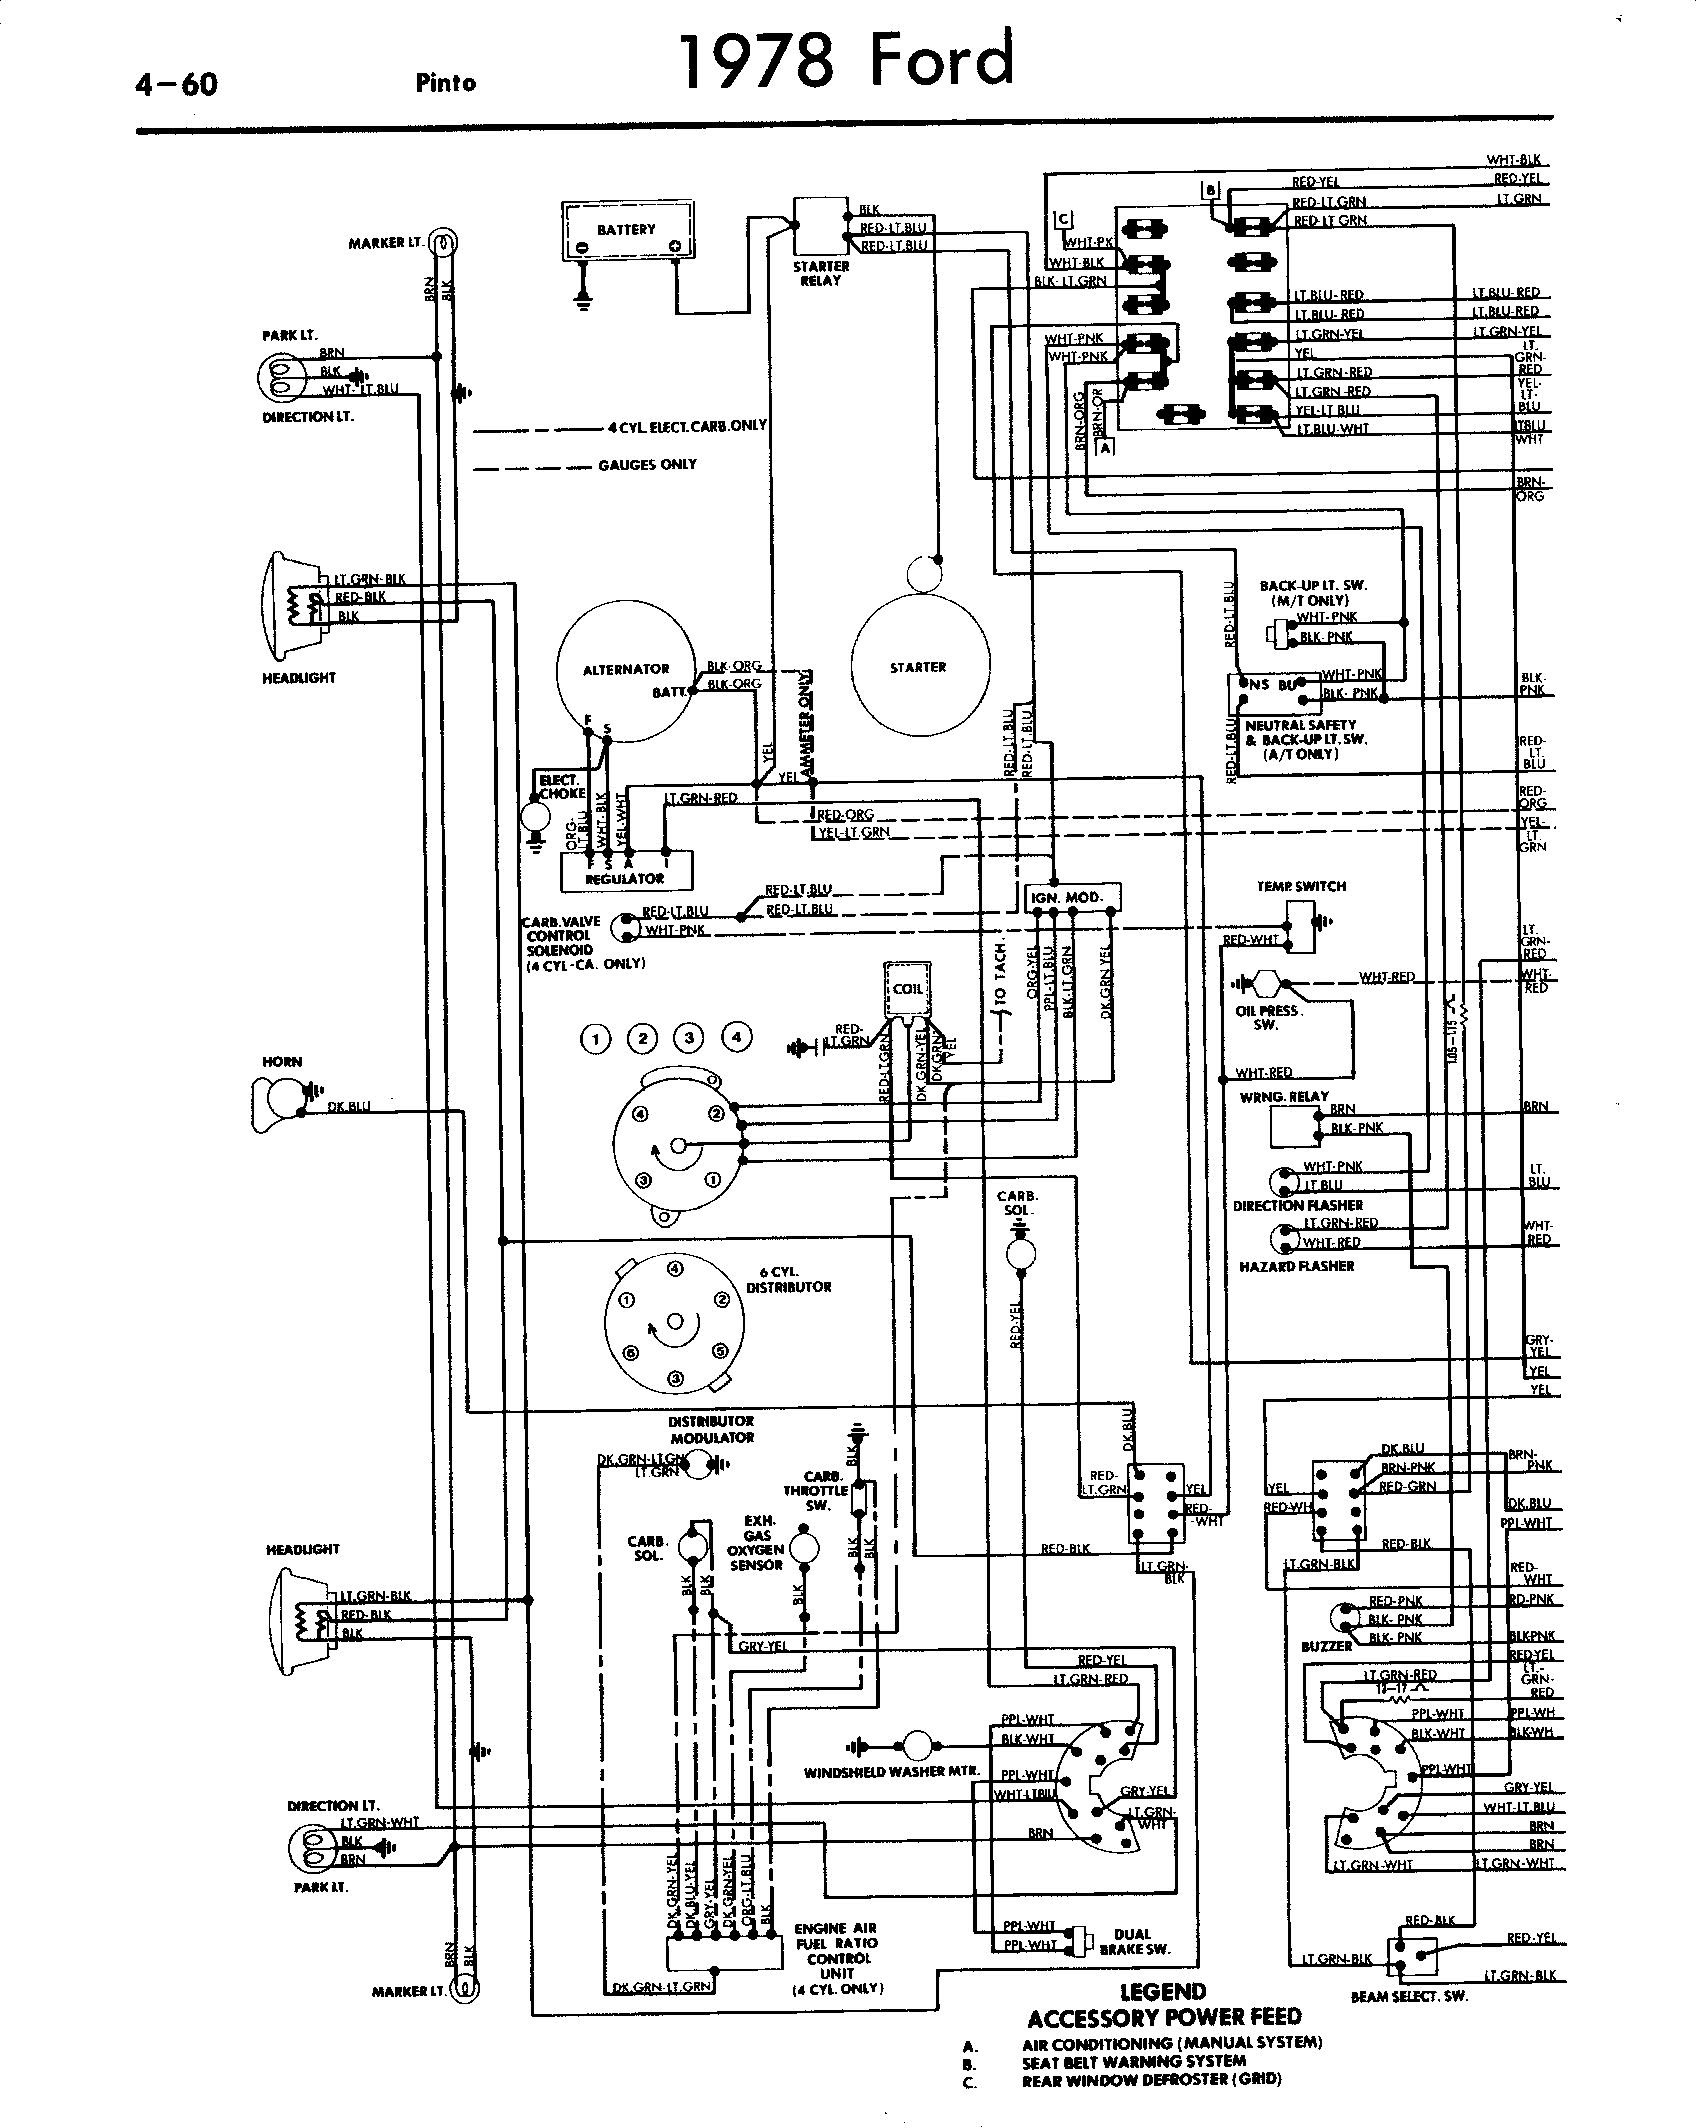 1978 Ford F 150 Wiring Harnes